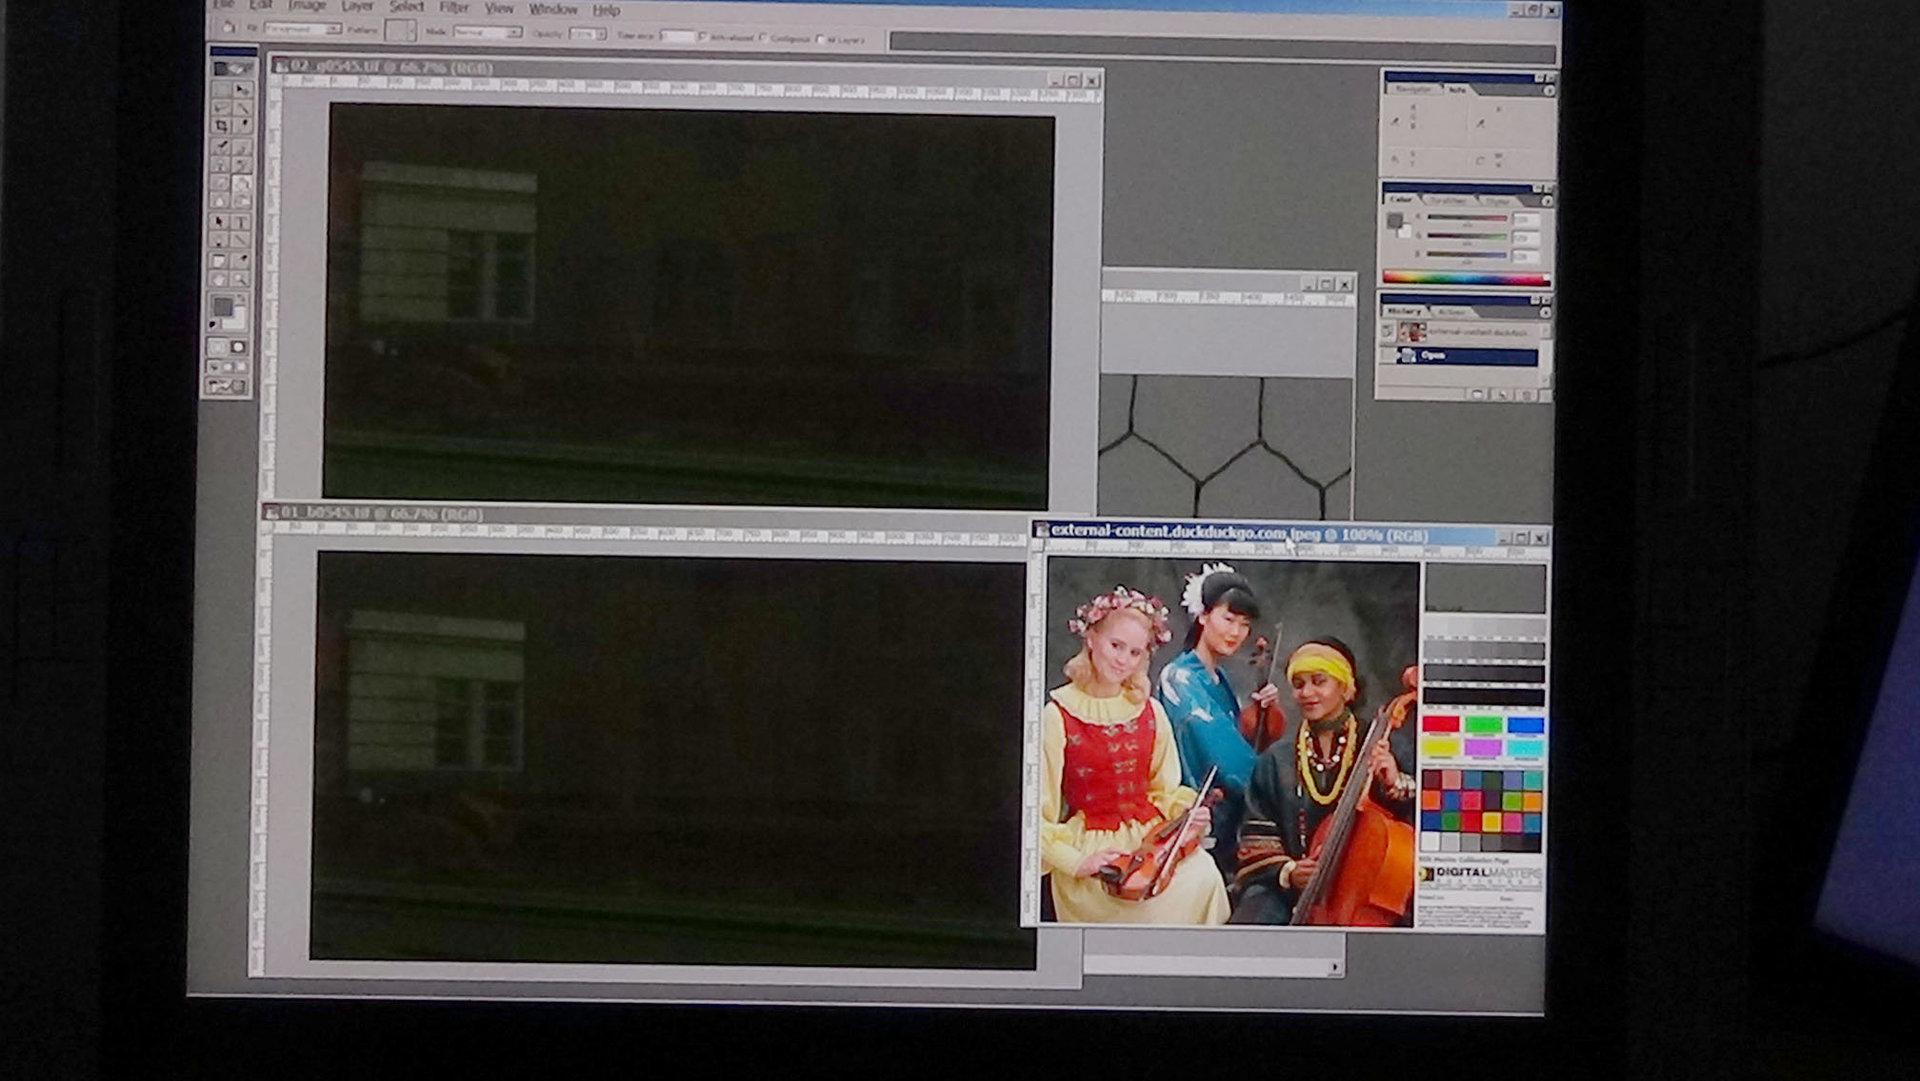 MonitorShot.jpg